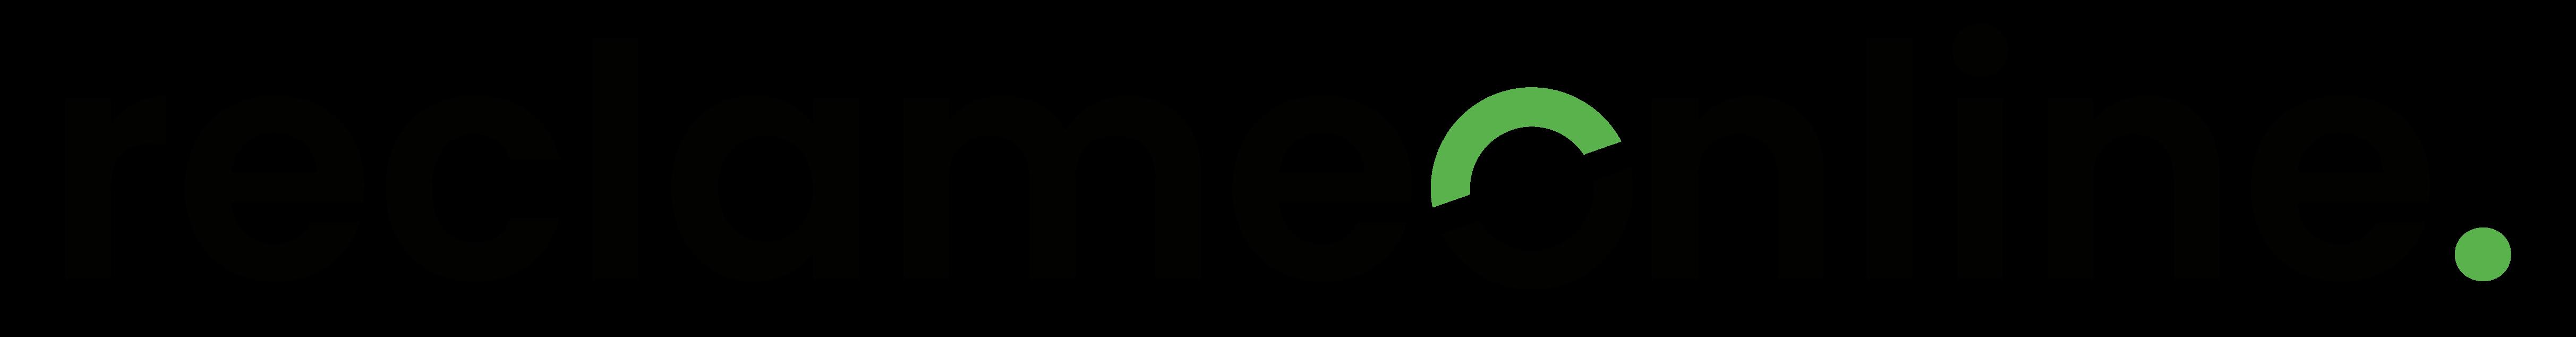 reclameonline-logo